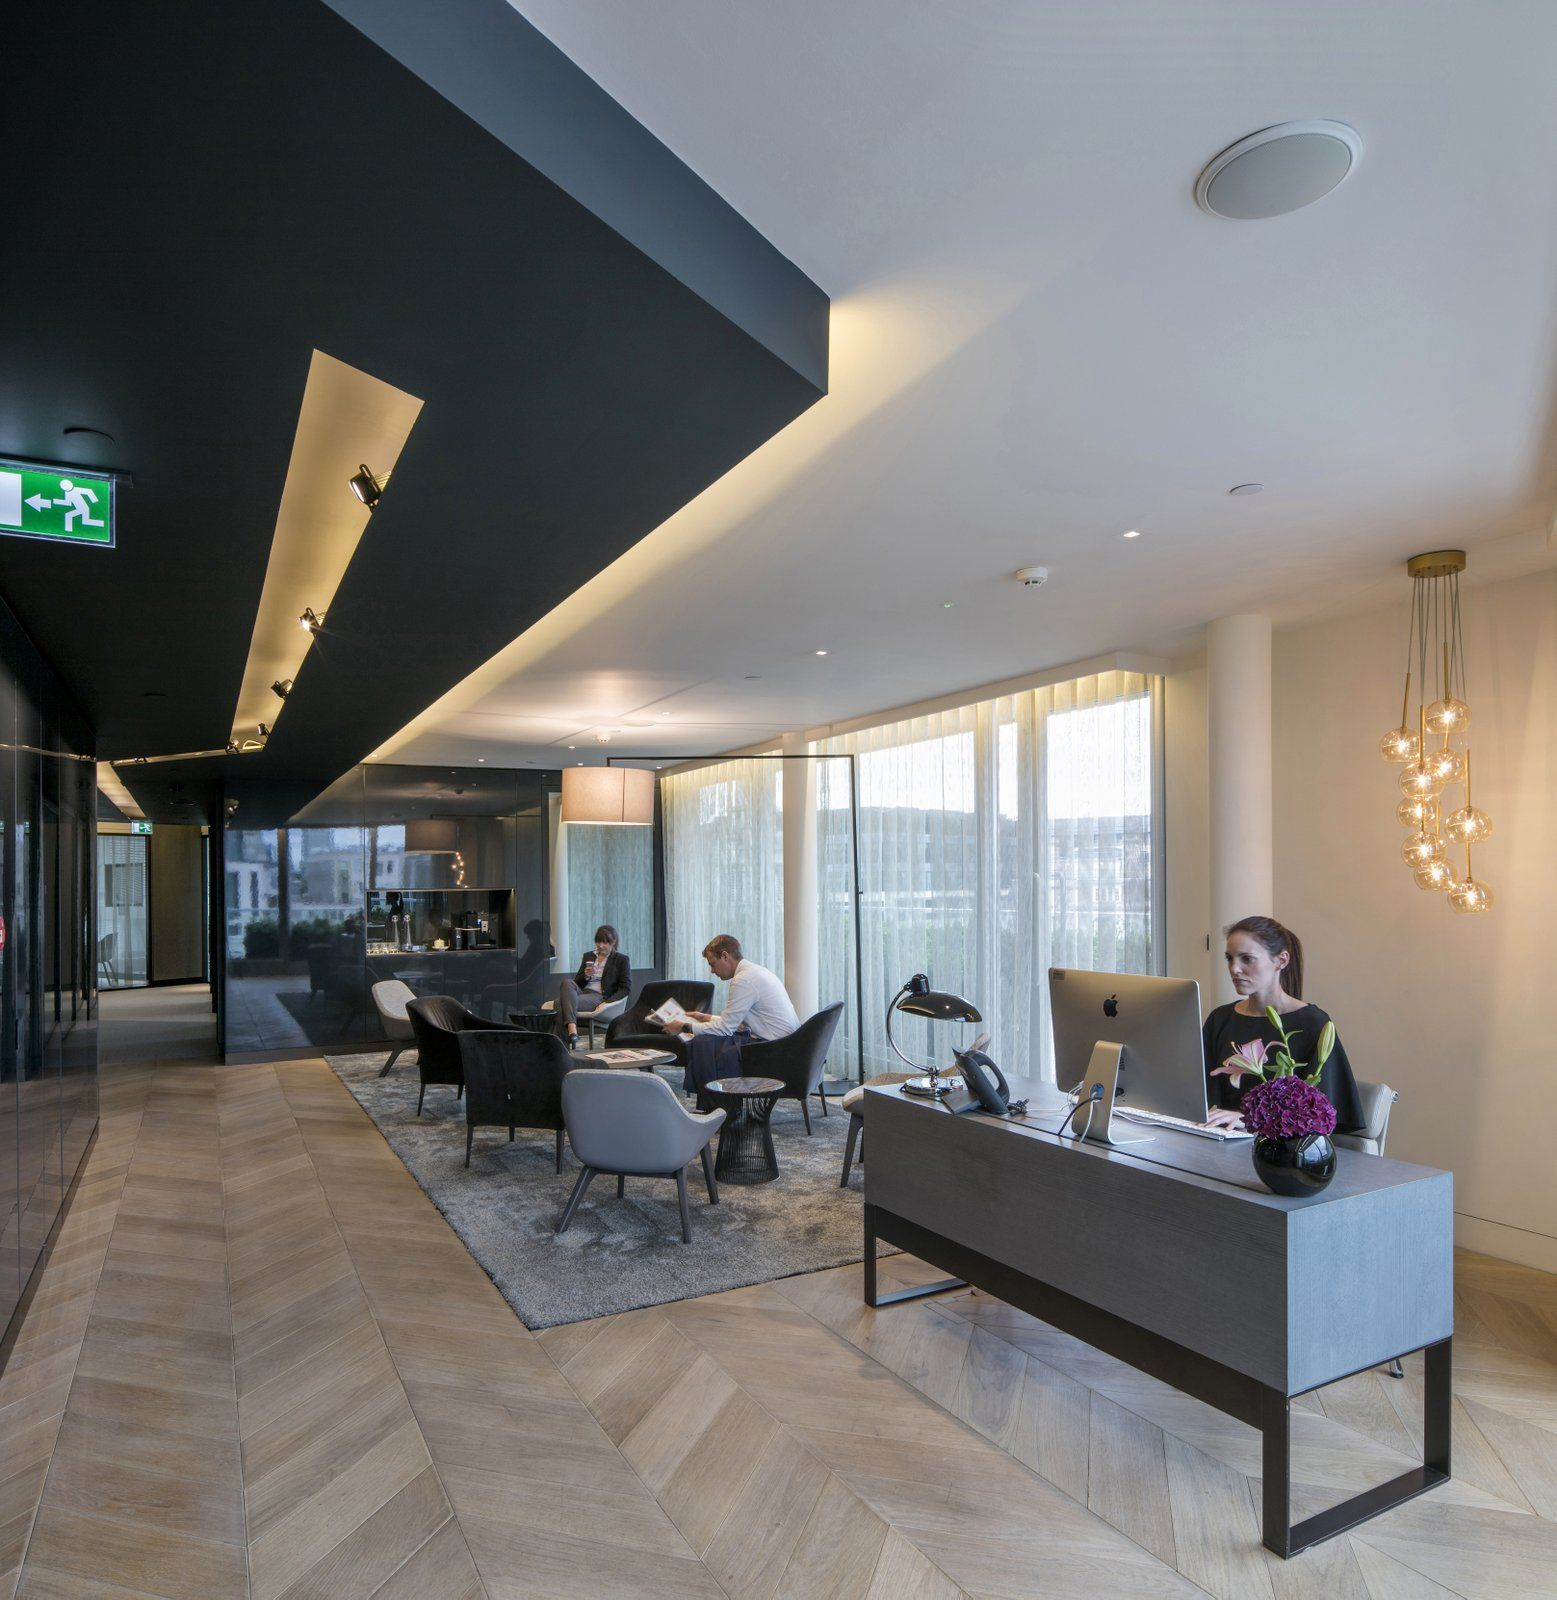 Cbre Offices London Office Interior Design Modern Office